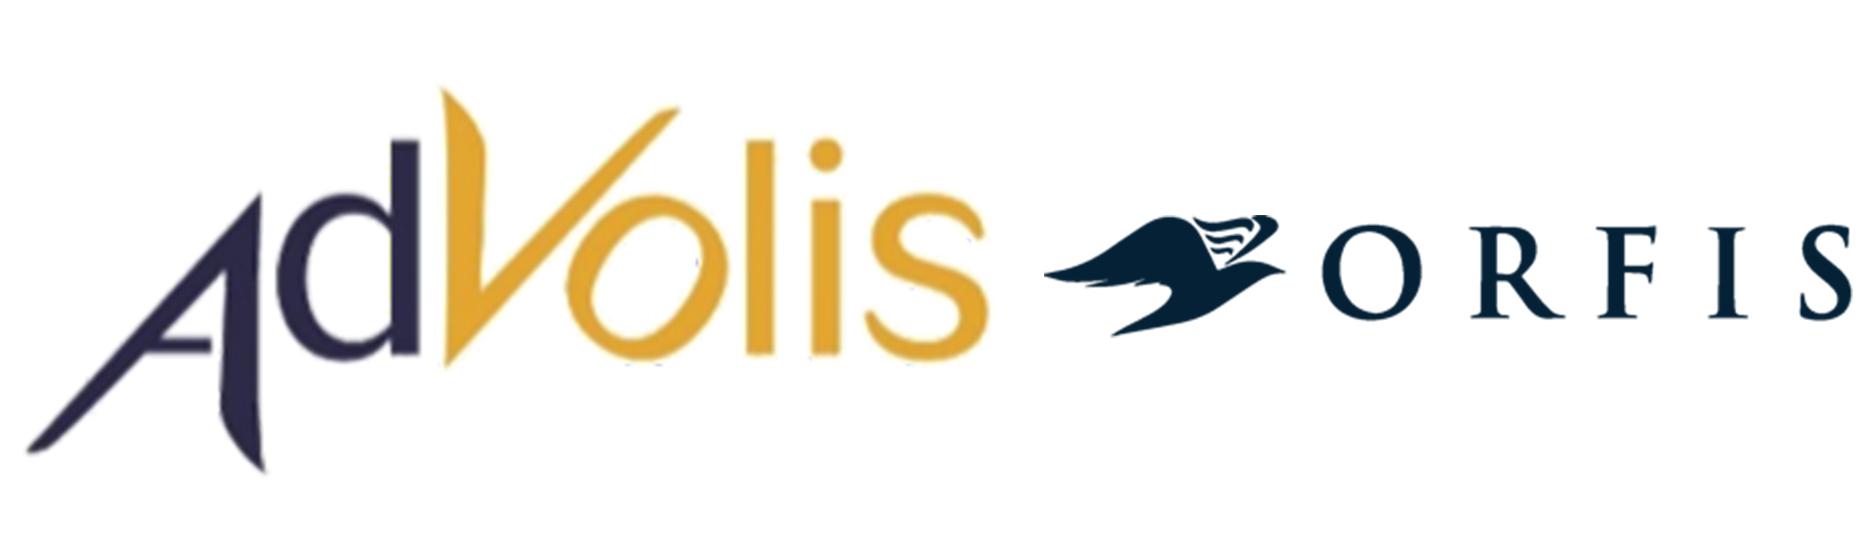 Cabinets Advolis et Orfis s'unissent